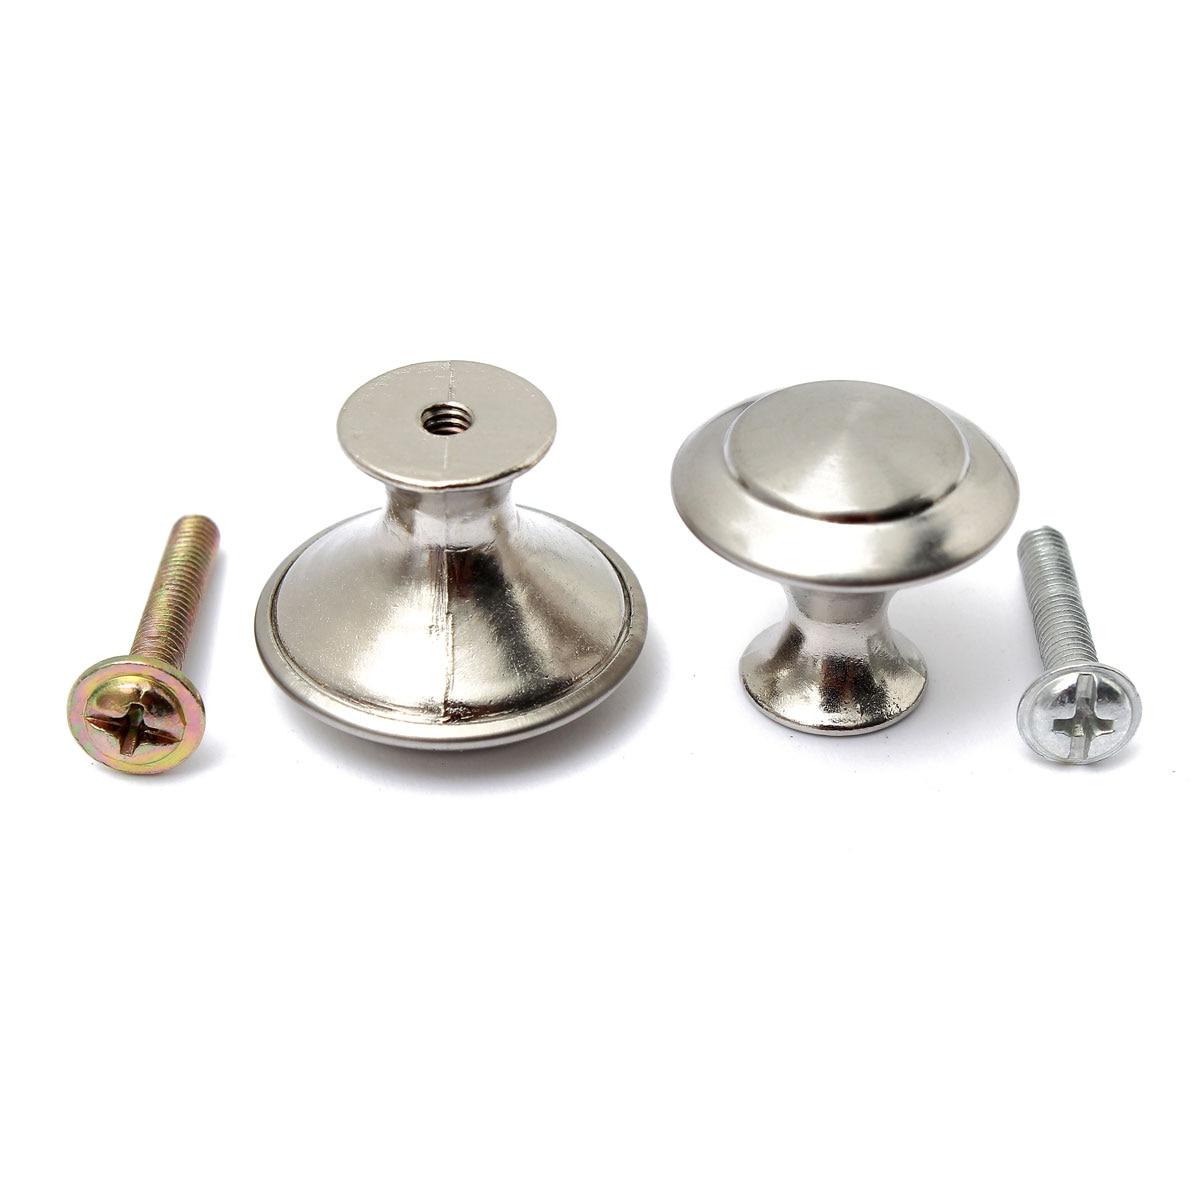 Stainless Steel Satin Kitchen Cabinet Pull Knob 24 28mm